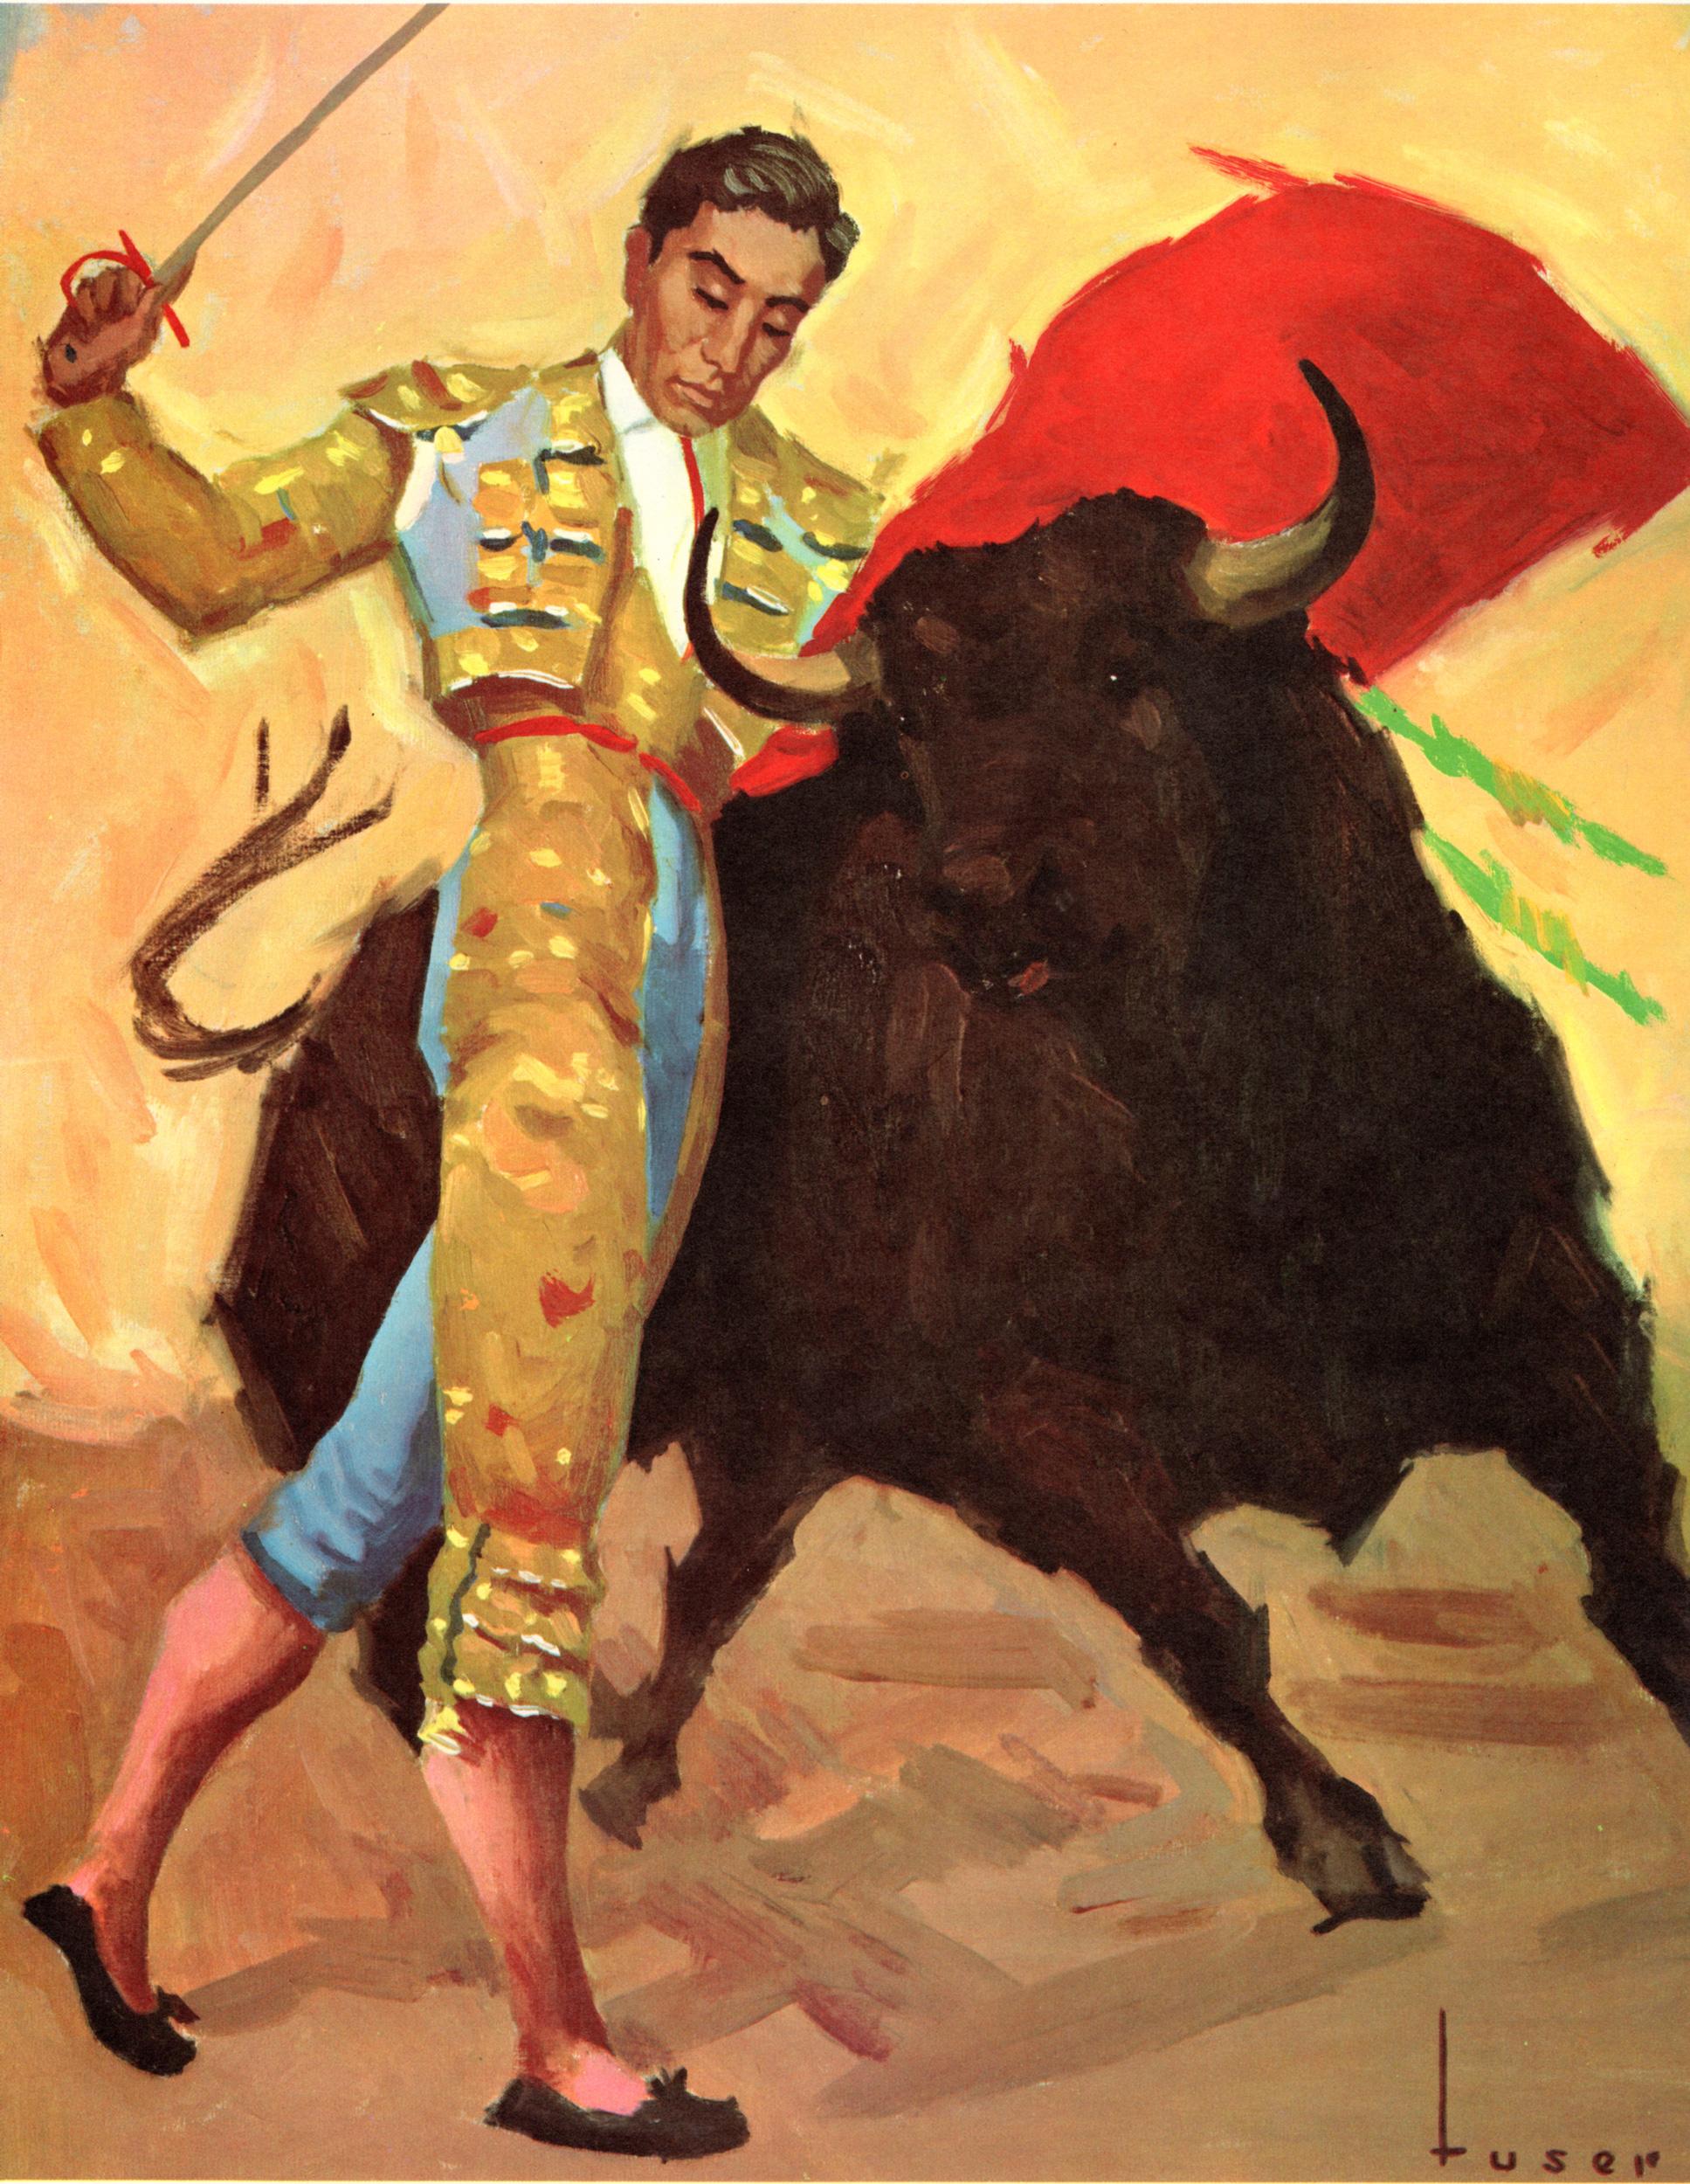 Matadors, Bullfighting by Tuser